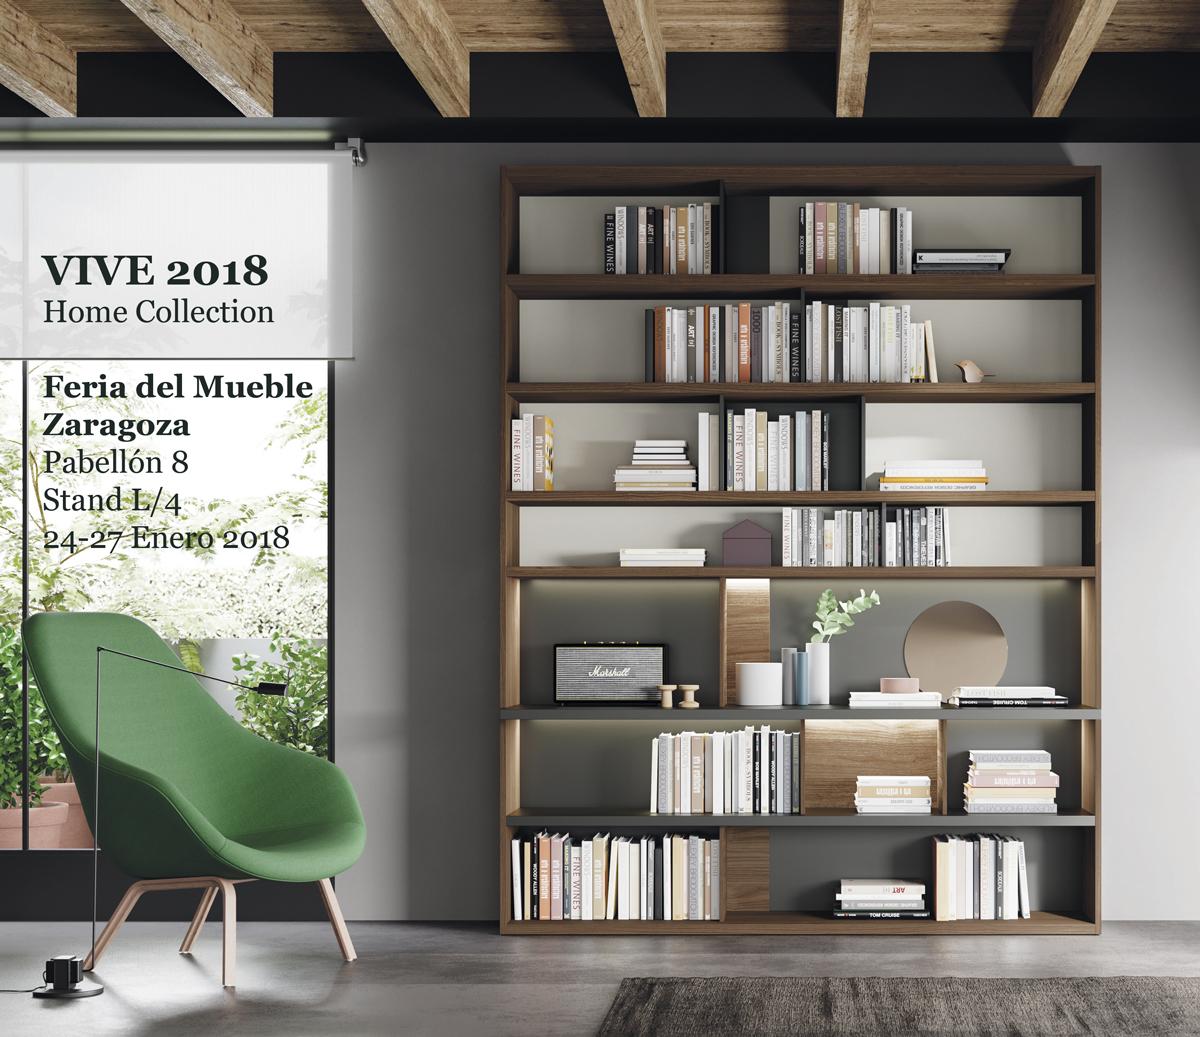 Feria del mueble zaragoza 2018 for Feria del mueble zaragoza